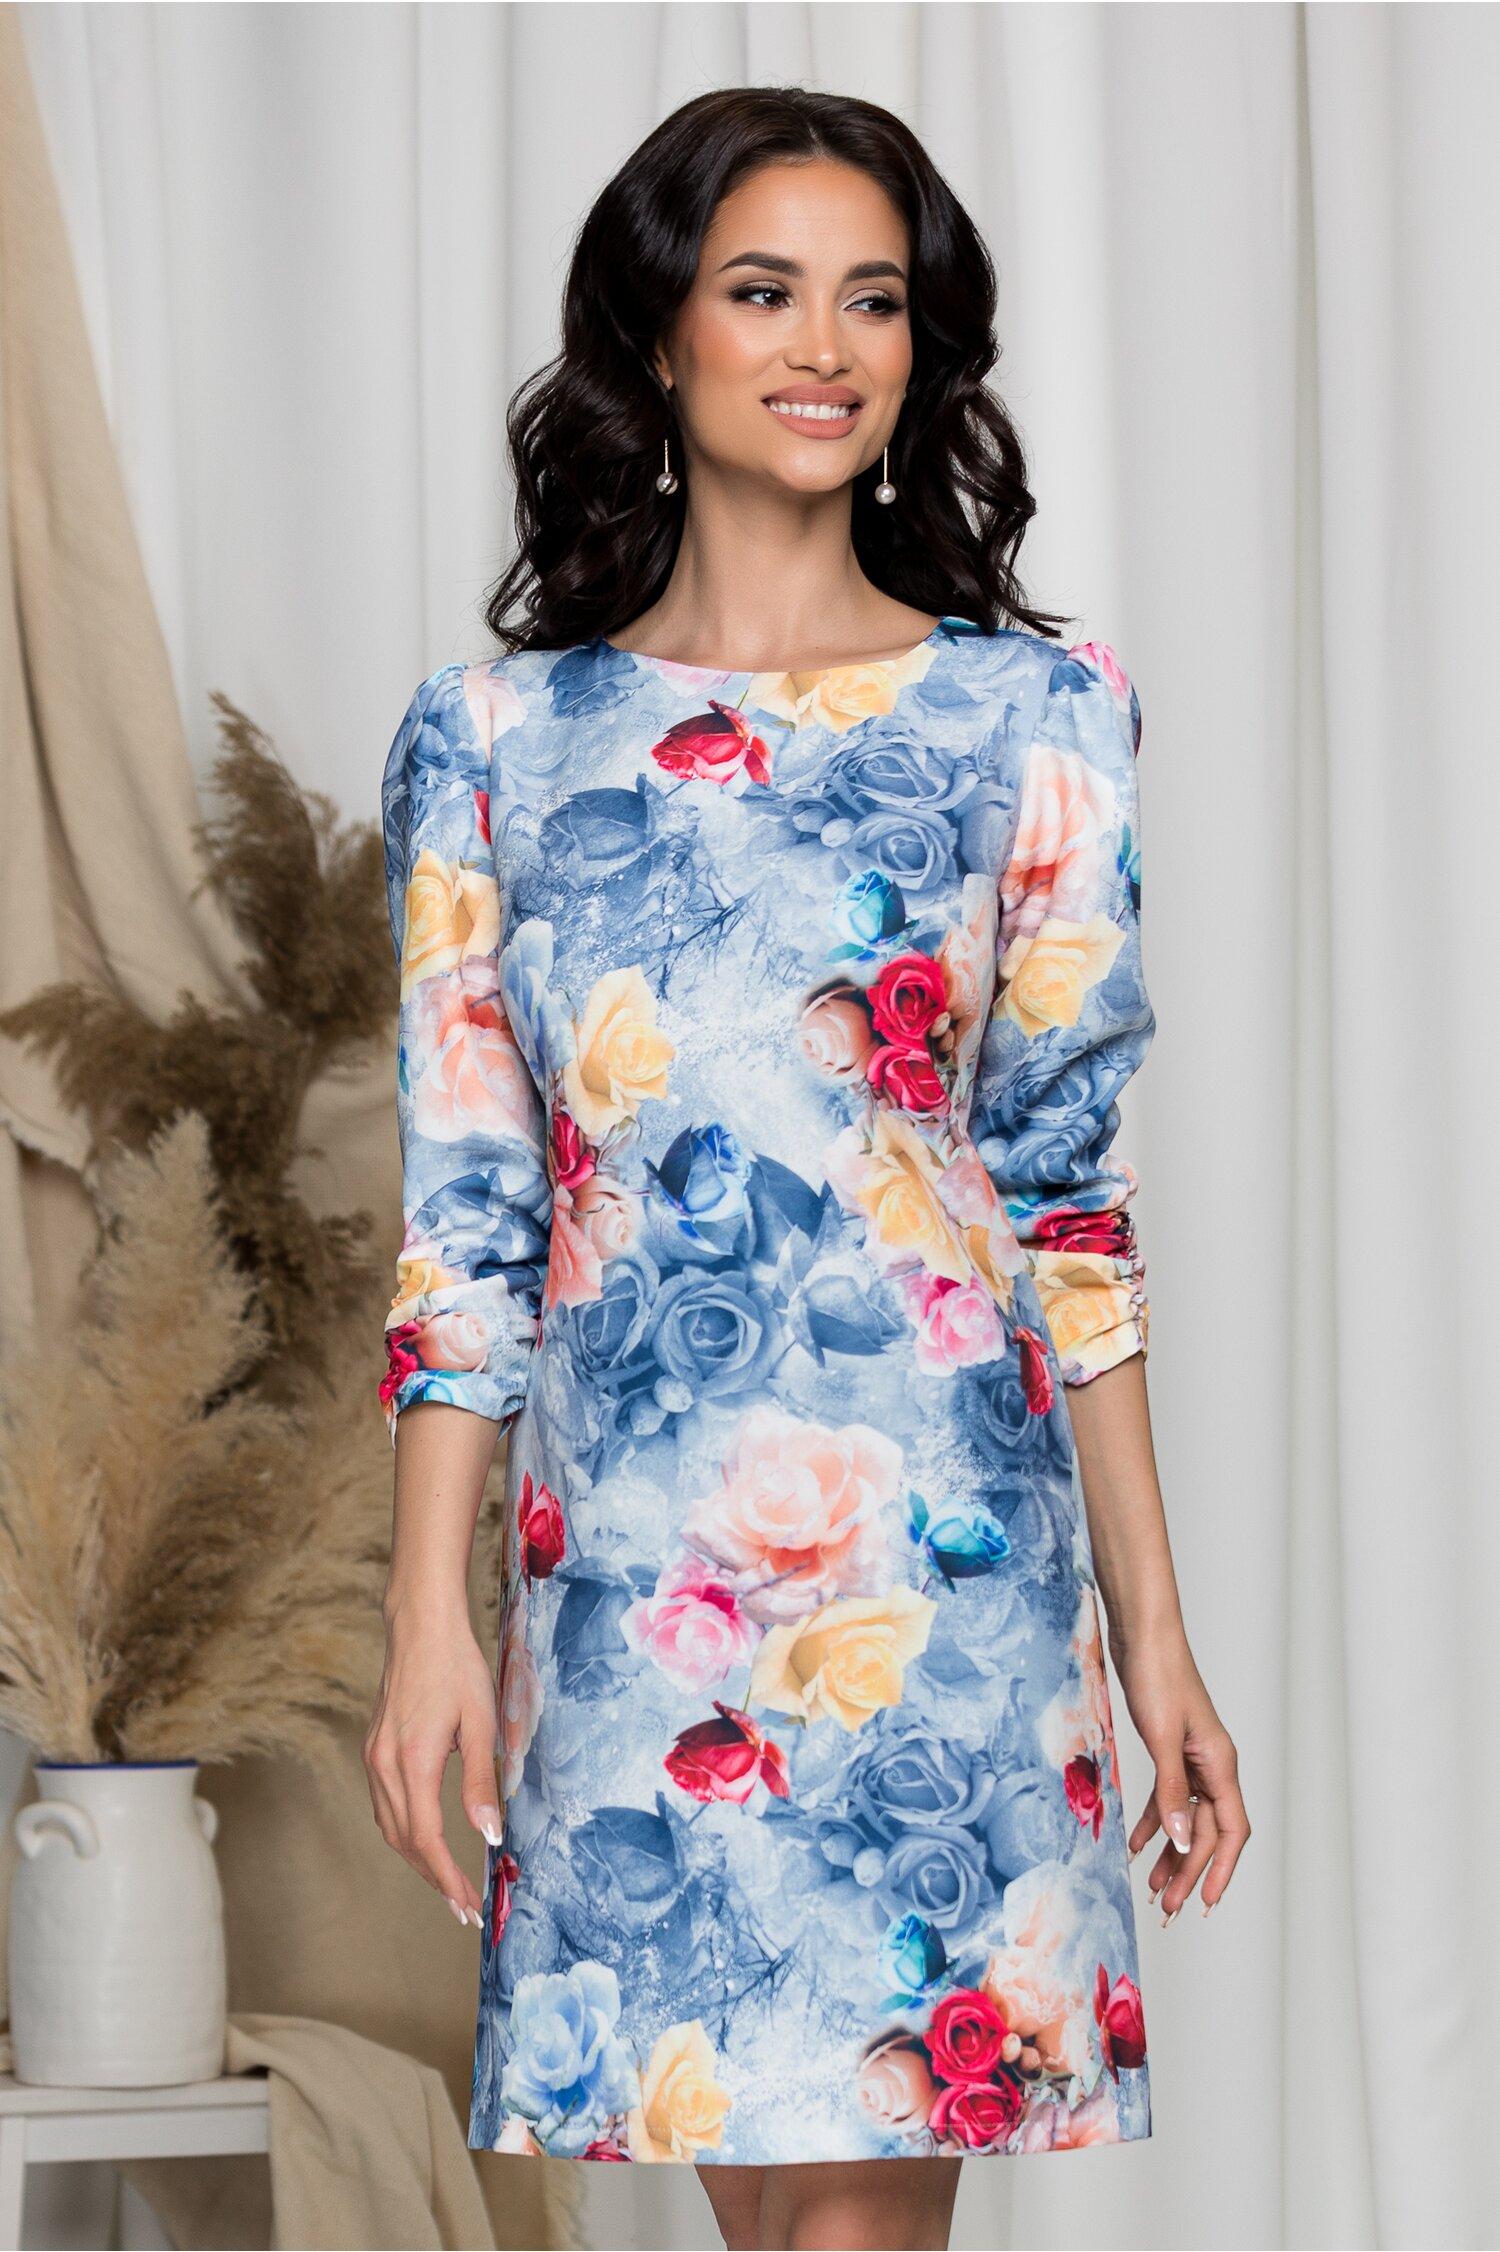 Rochie Adelia bleu cu trandafiri imagine dyfashion.ro 2021